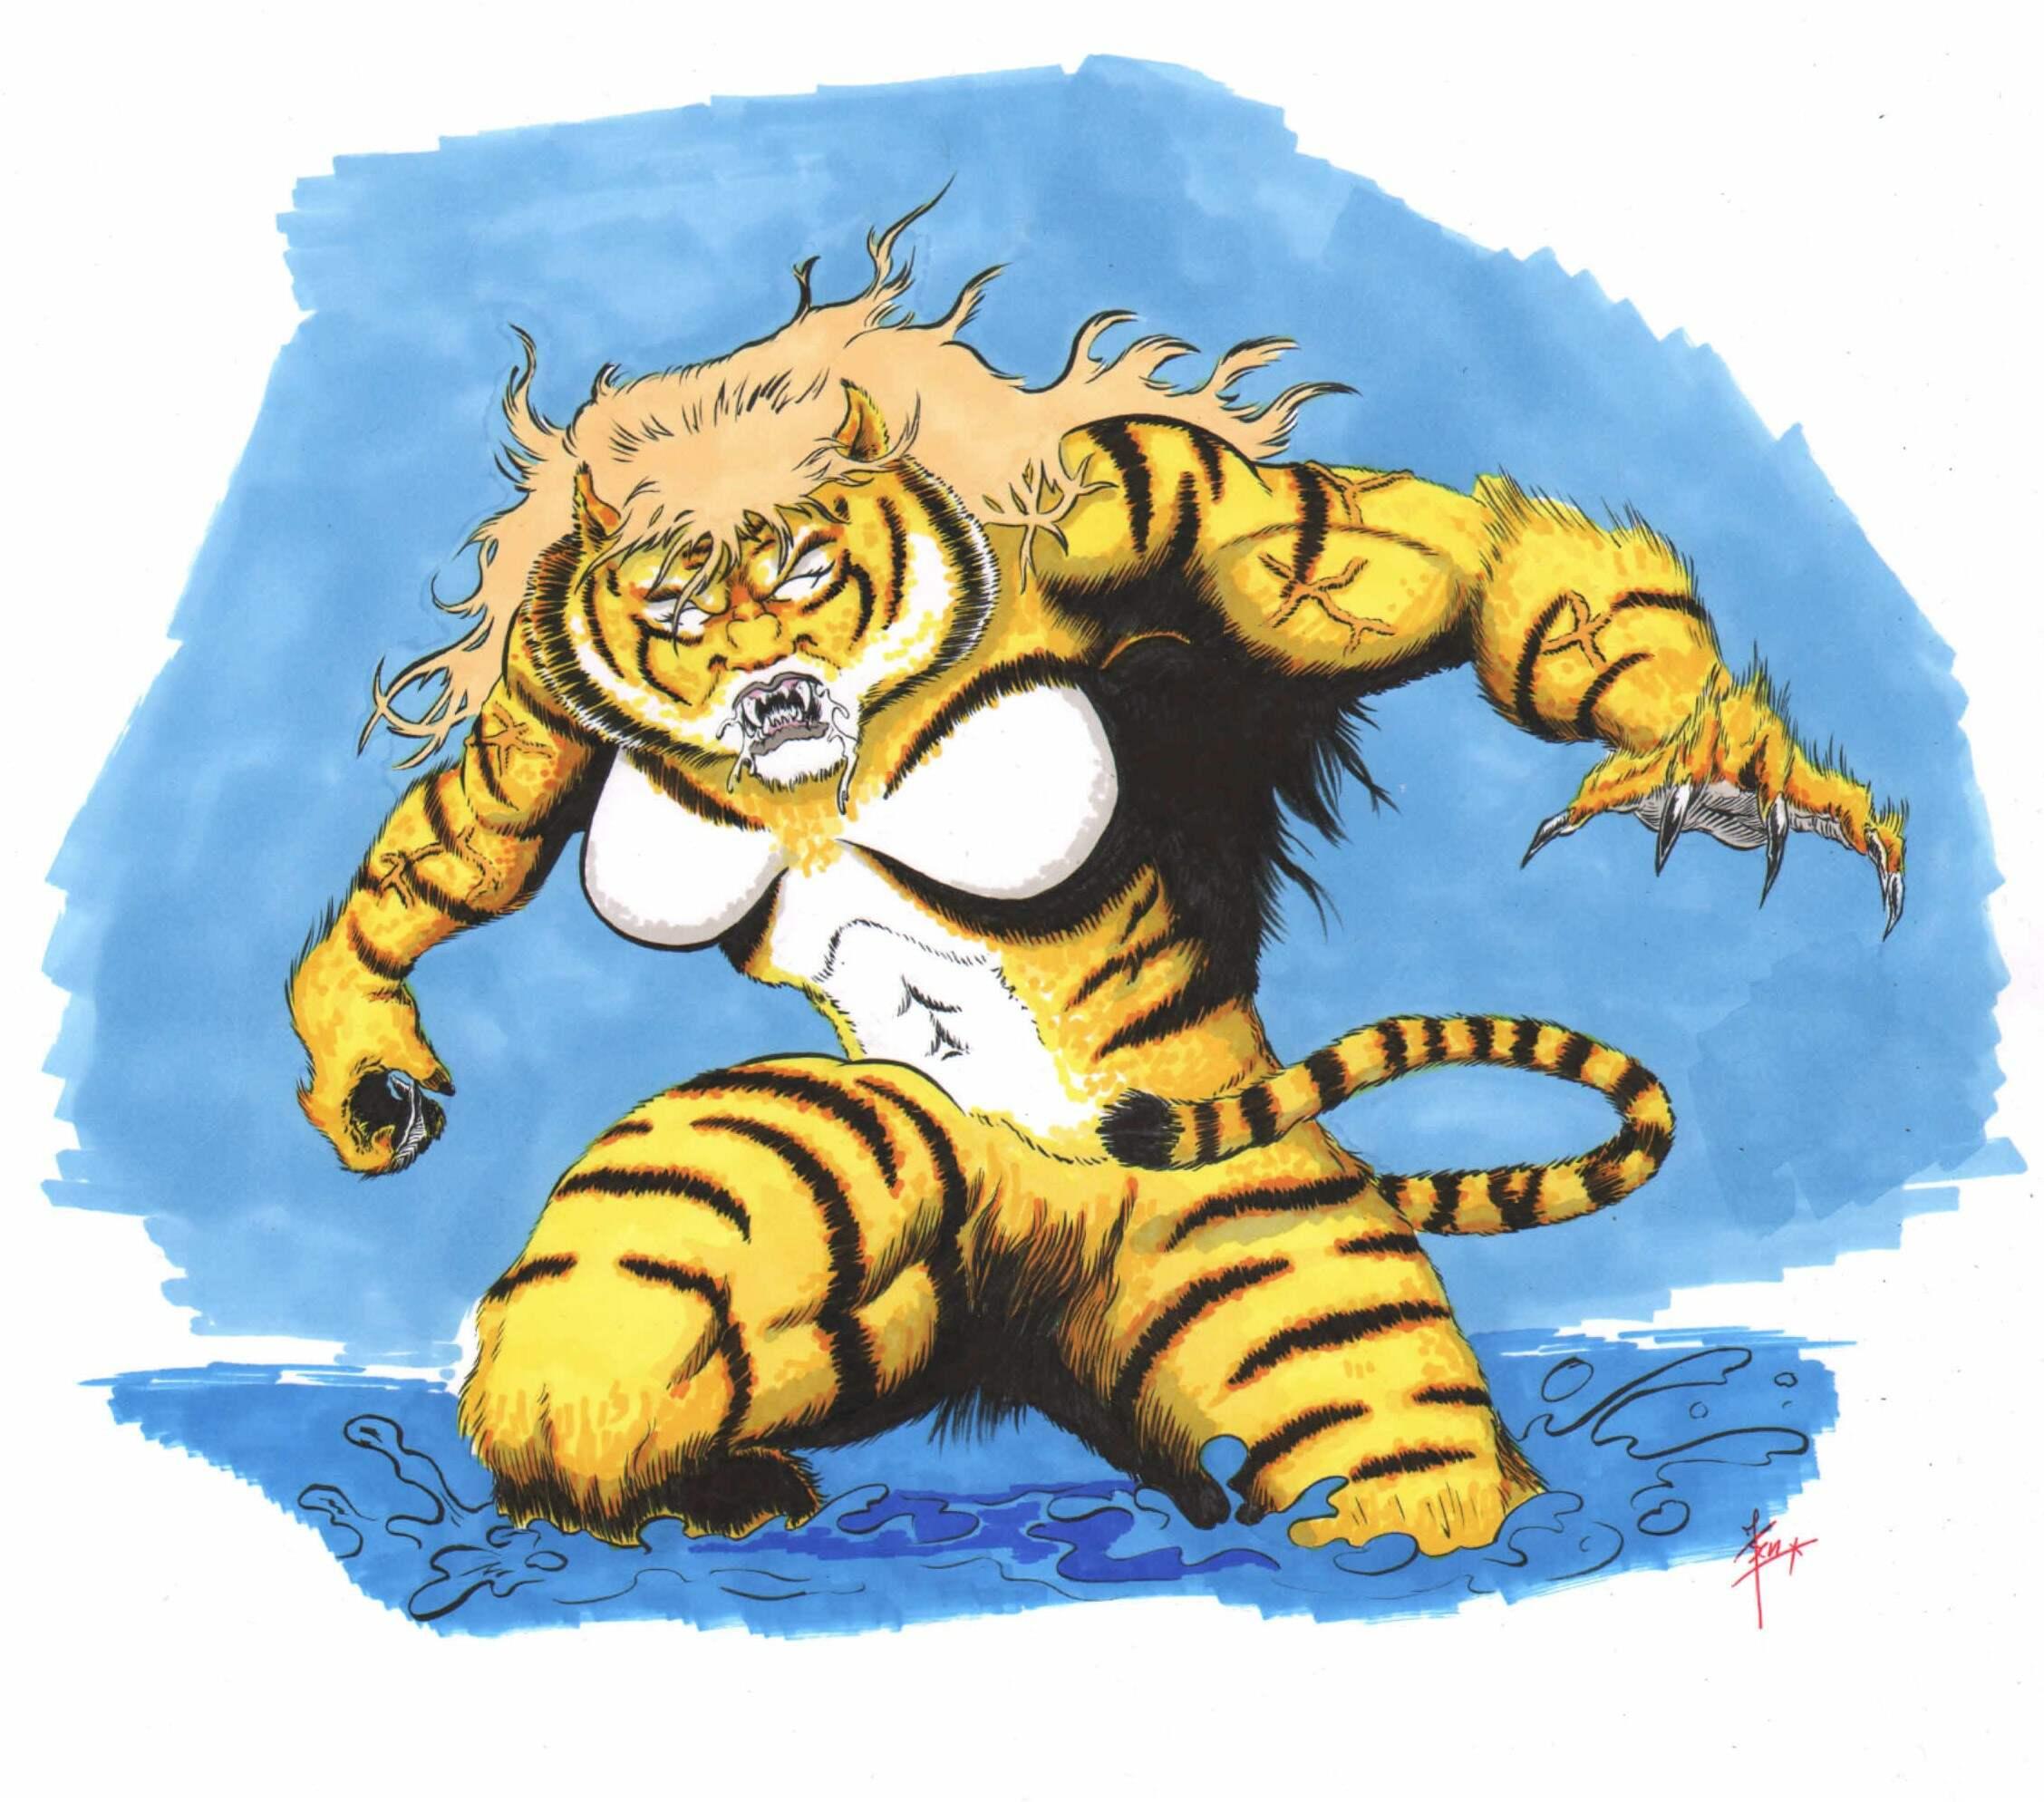 T'shara the Tigress